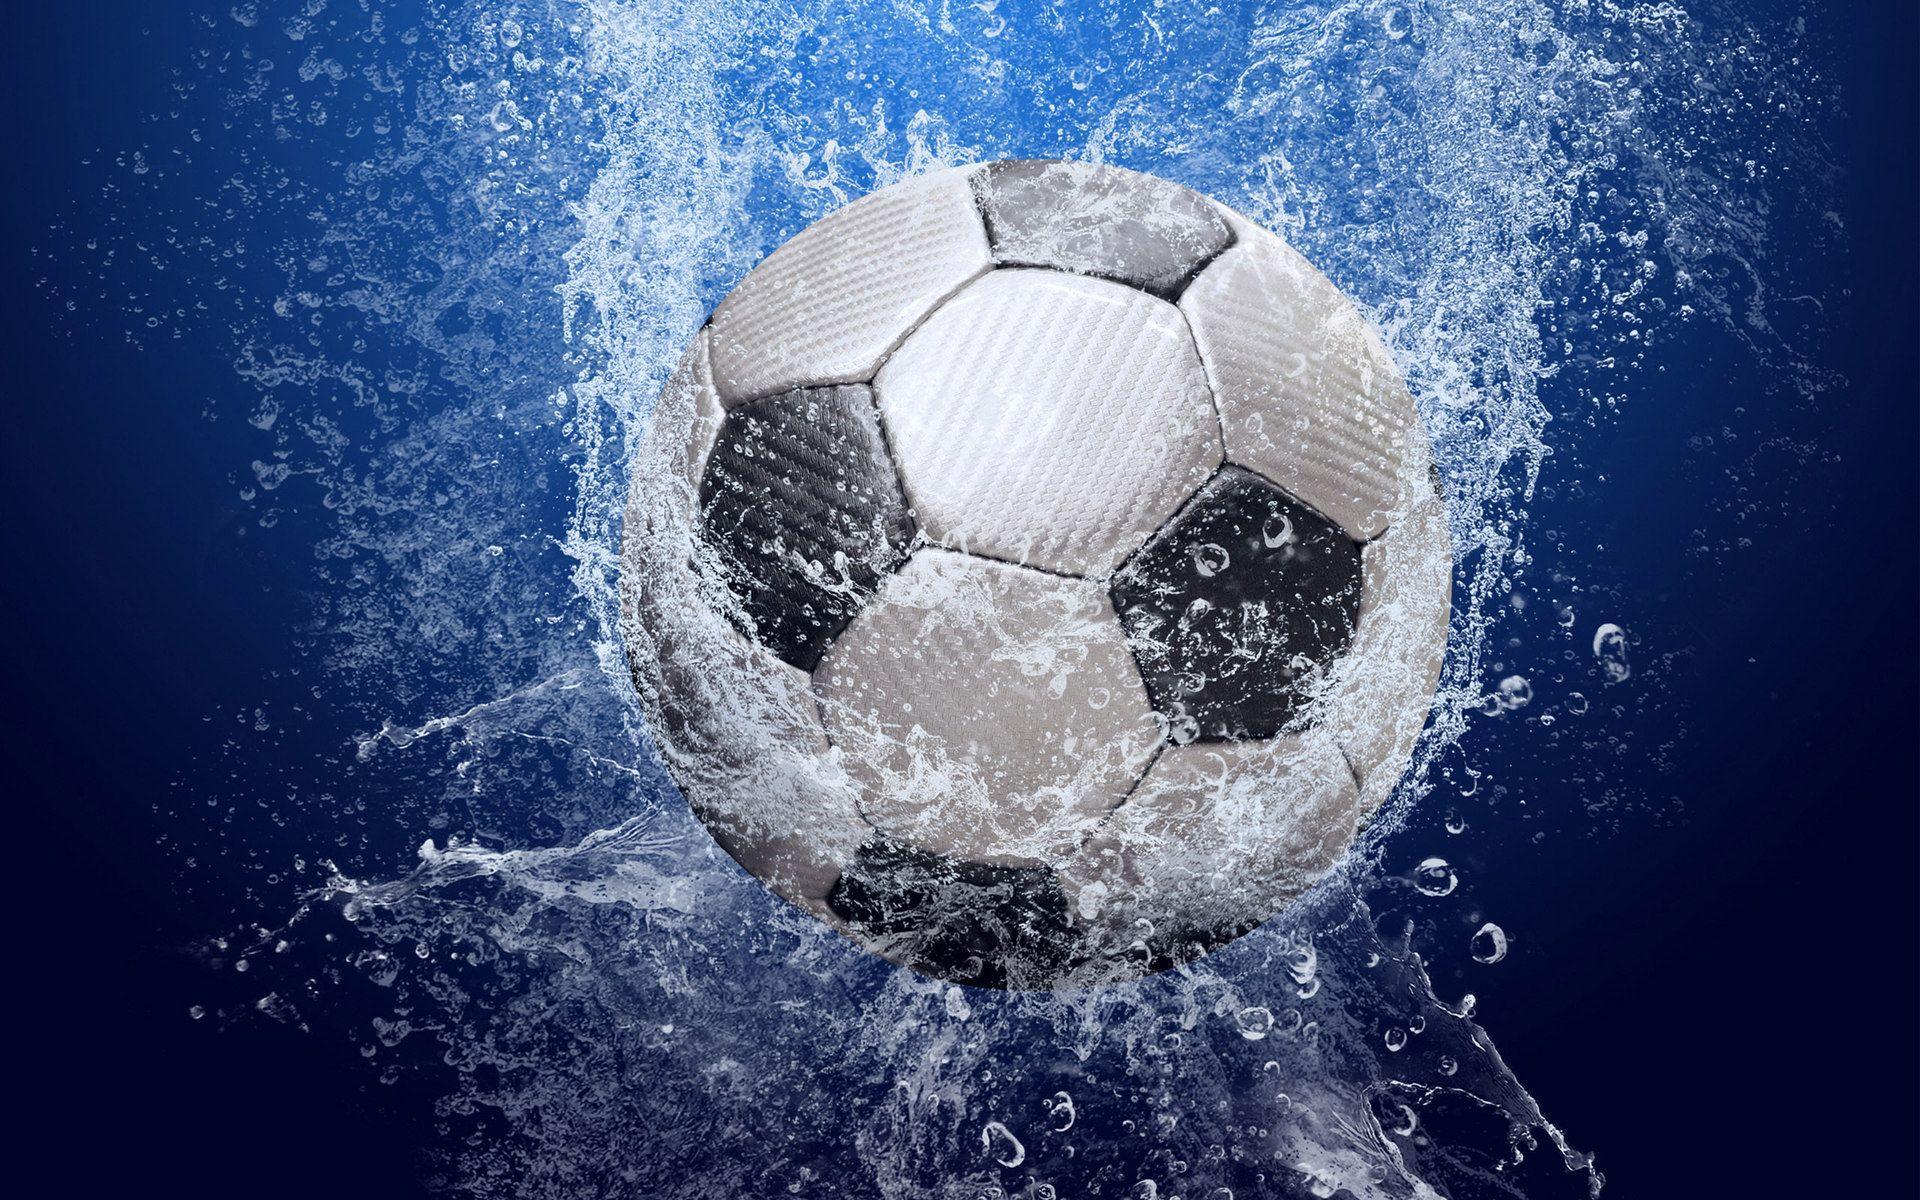 Soccer Wallpaper Hd 2012 35014 Wallpapers In Football